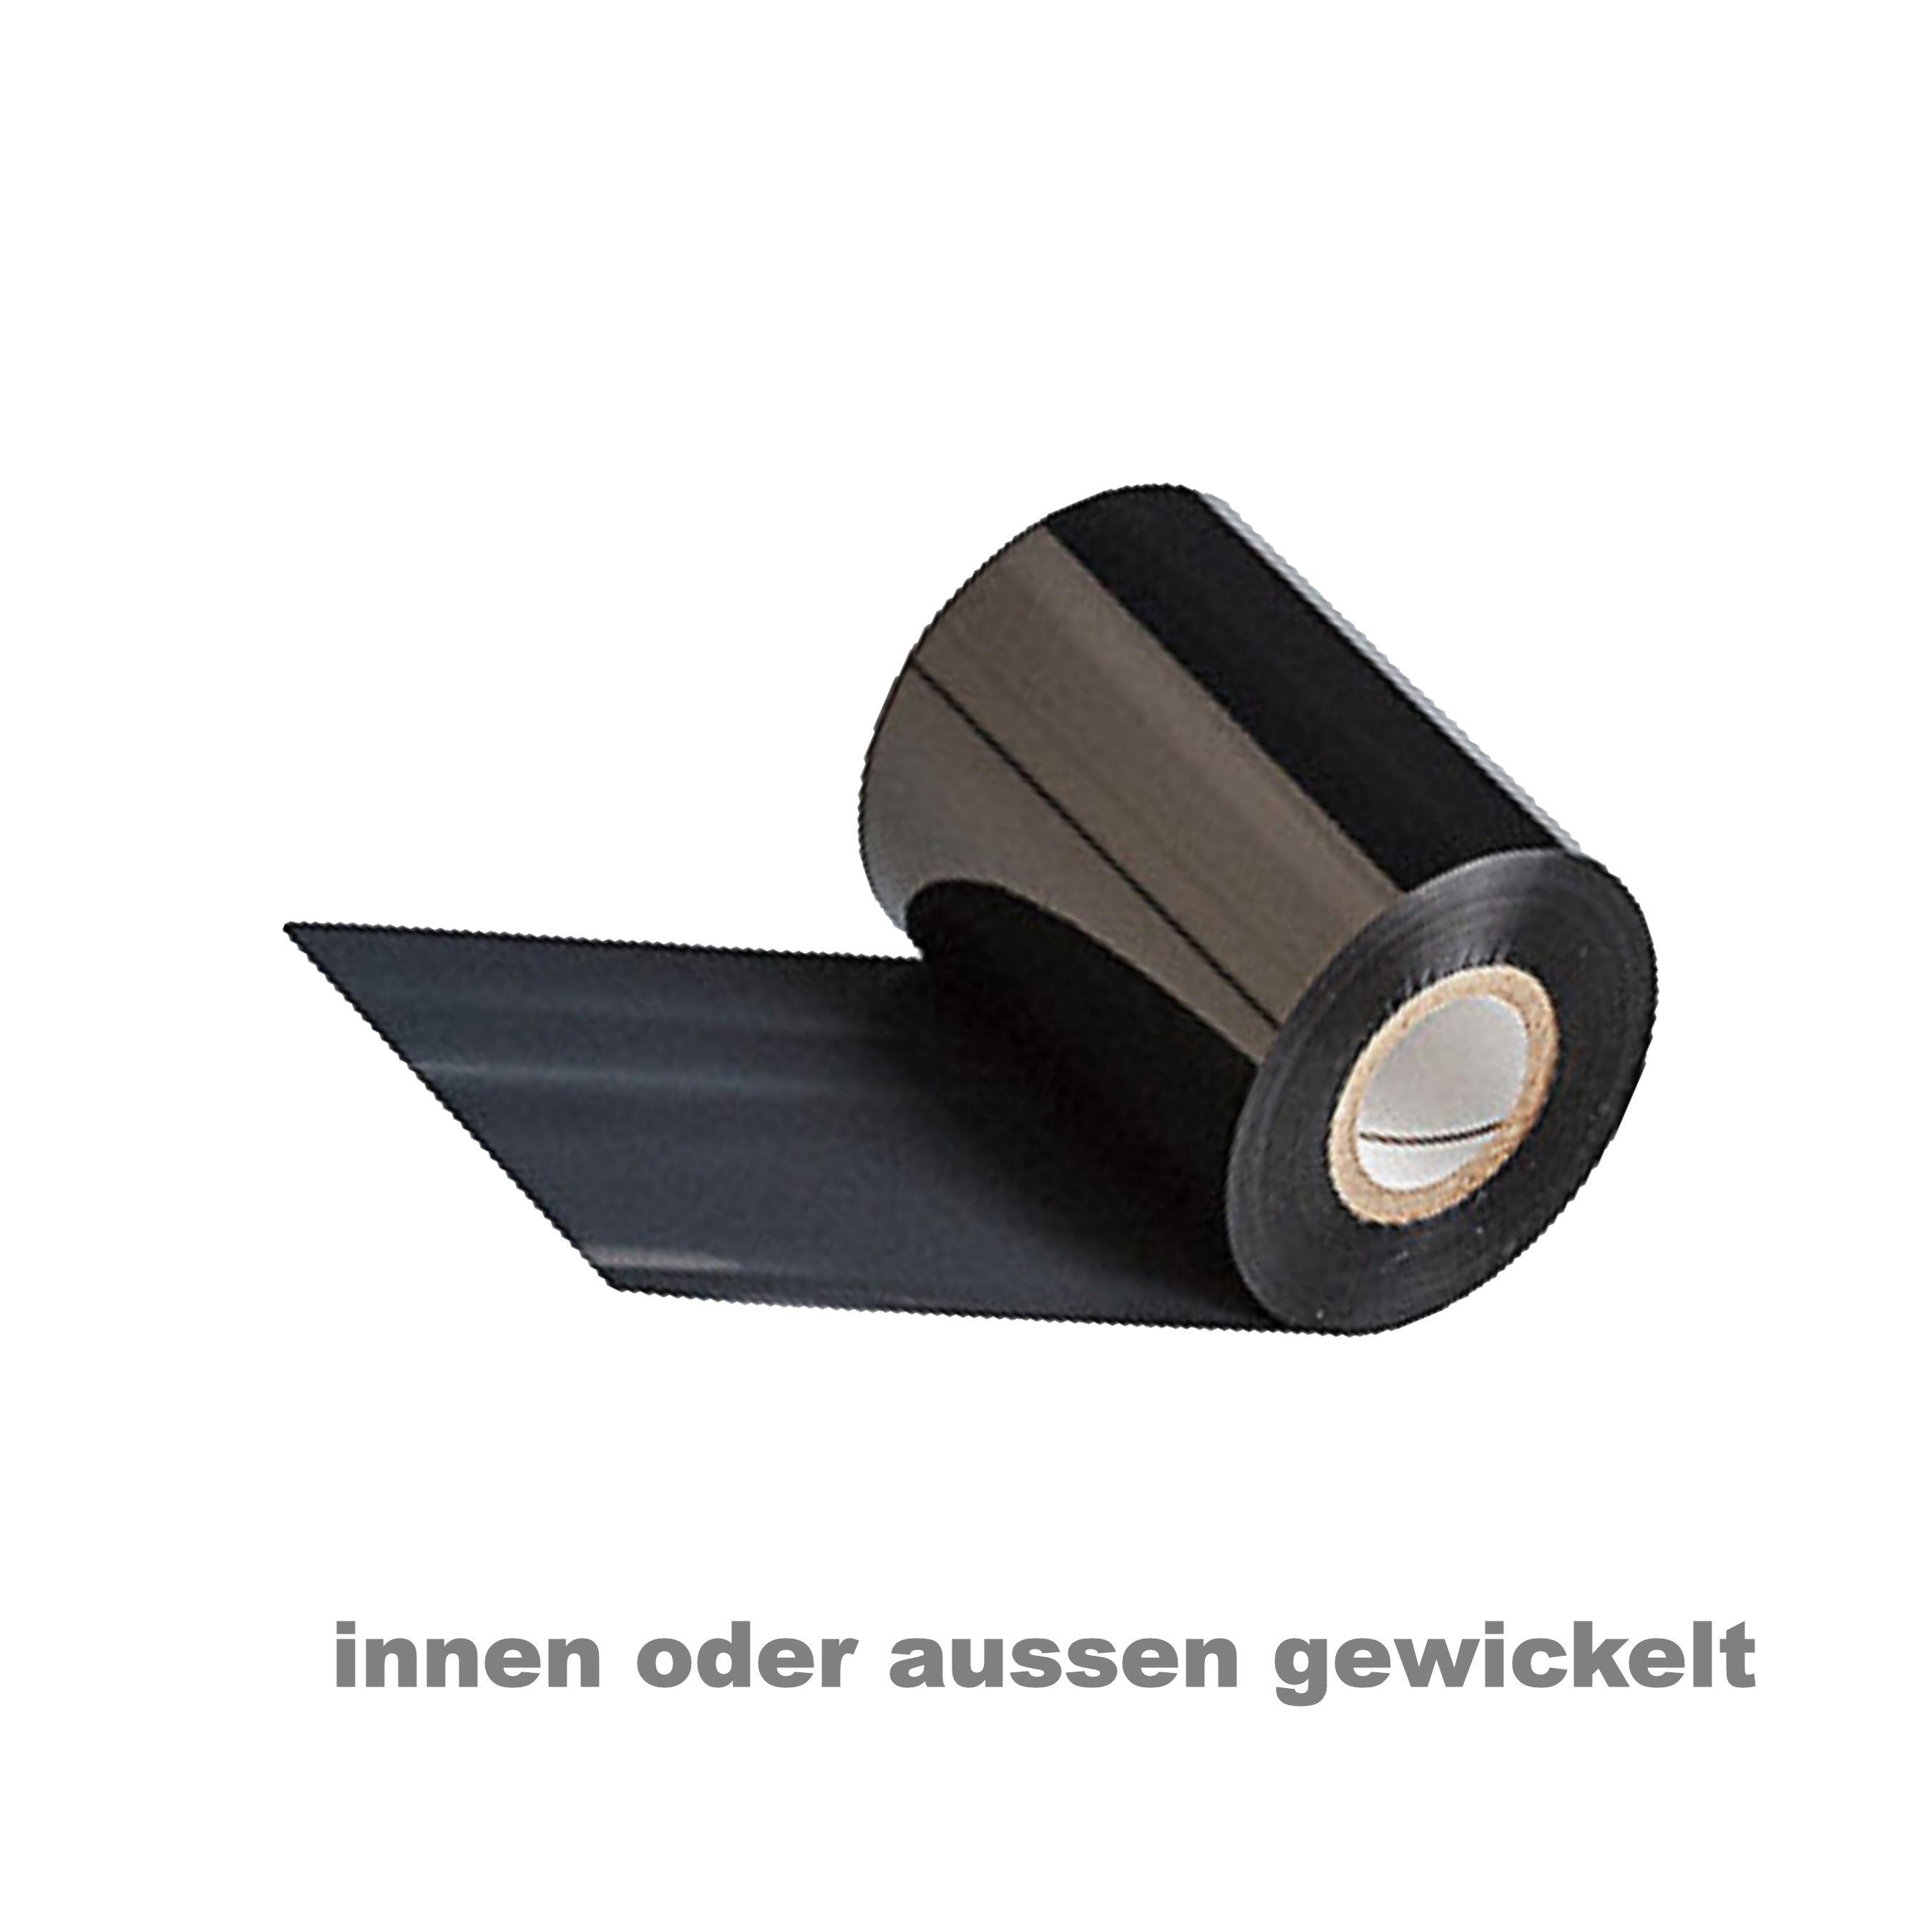 Thermotransfer Farbband f/ür Industriedrucker | Farbe: Gr/ün Breite x L/änge 1 Rolle 40mm x 300m HUTNER Thermotransferfolie Wachs Qual: 100